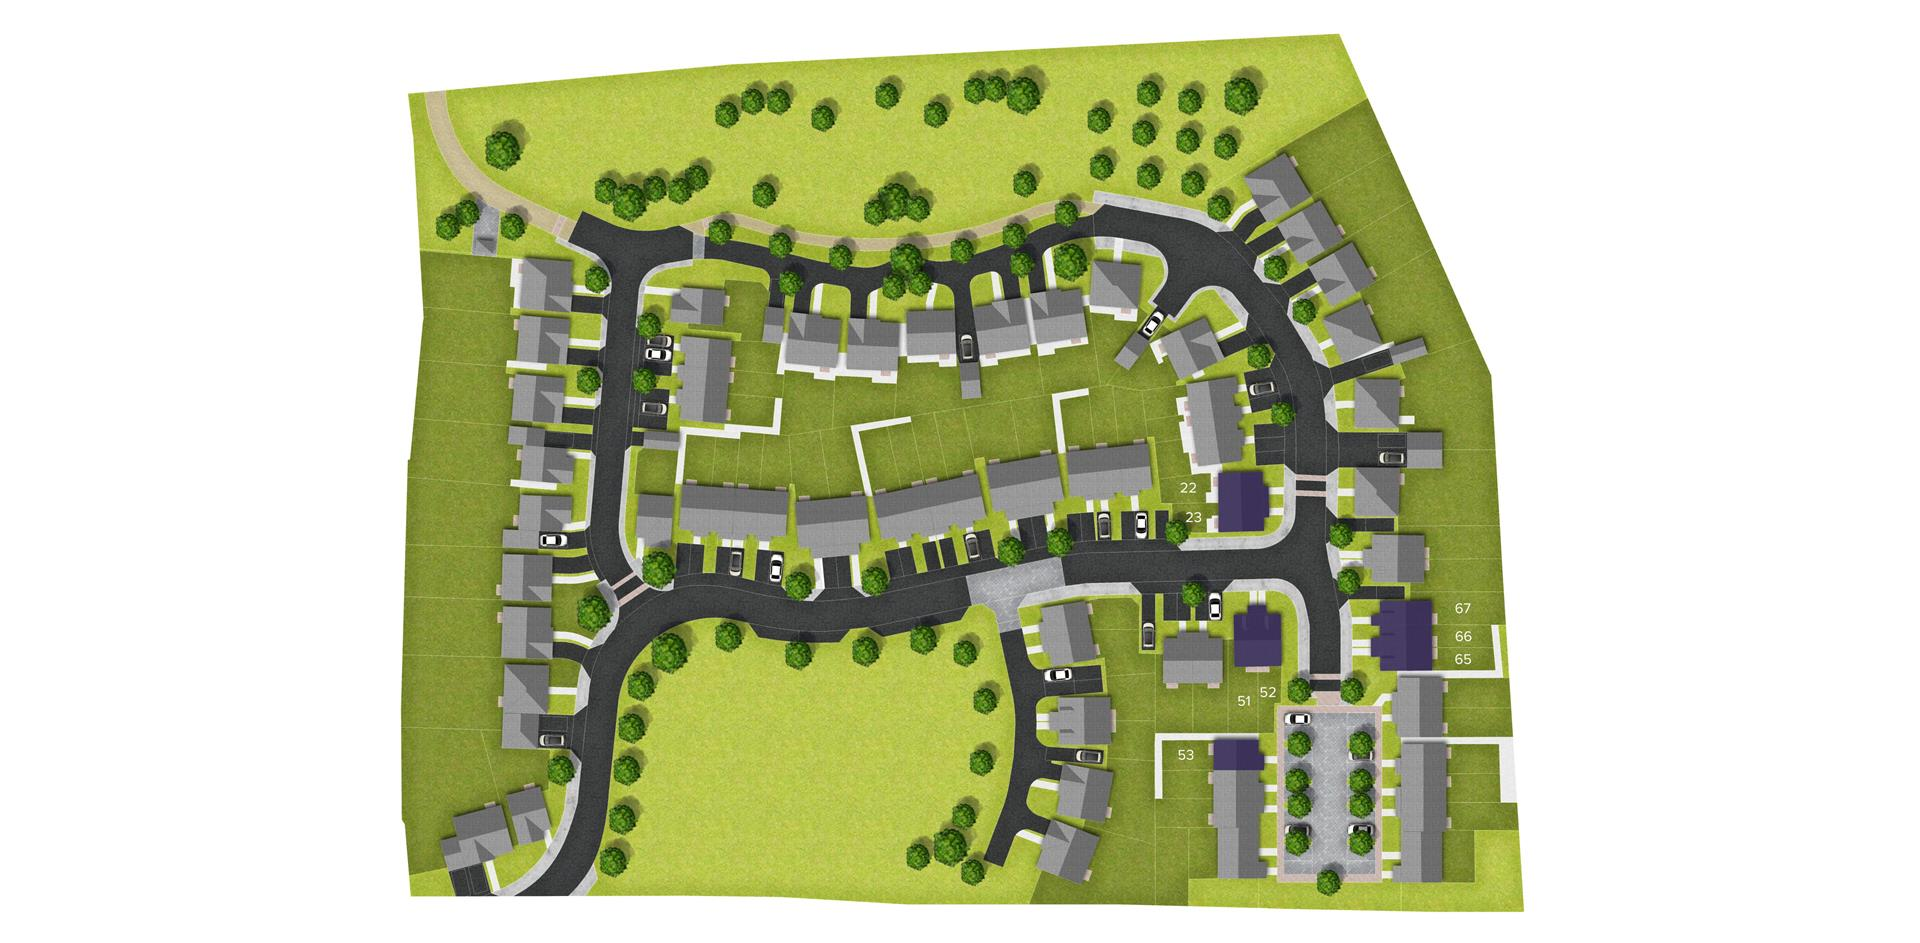 Abbeyvale_Bishops Hull, Taunton_sitemap_B.JPG